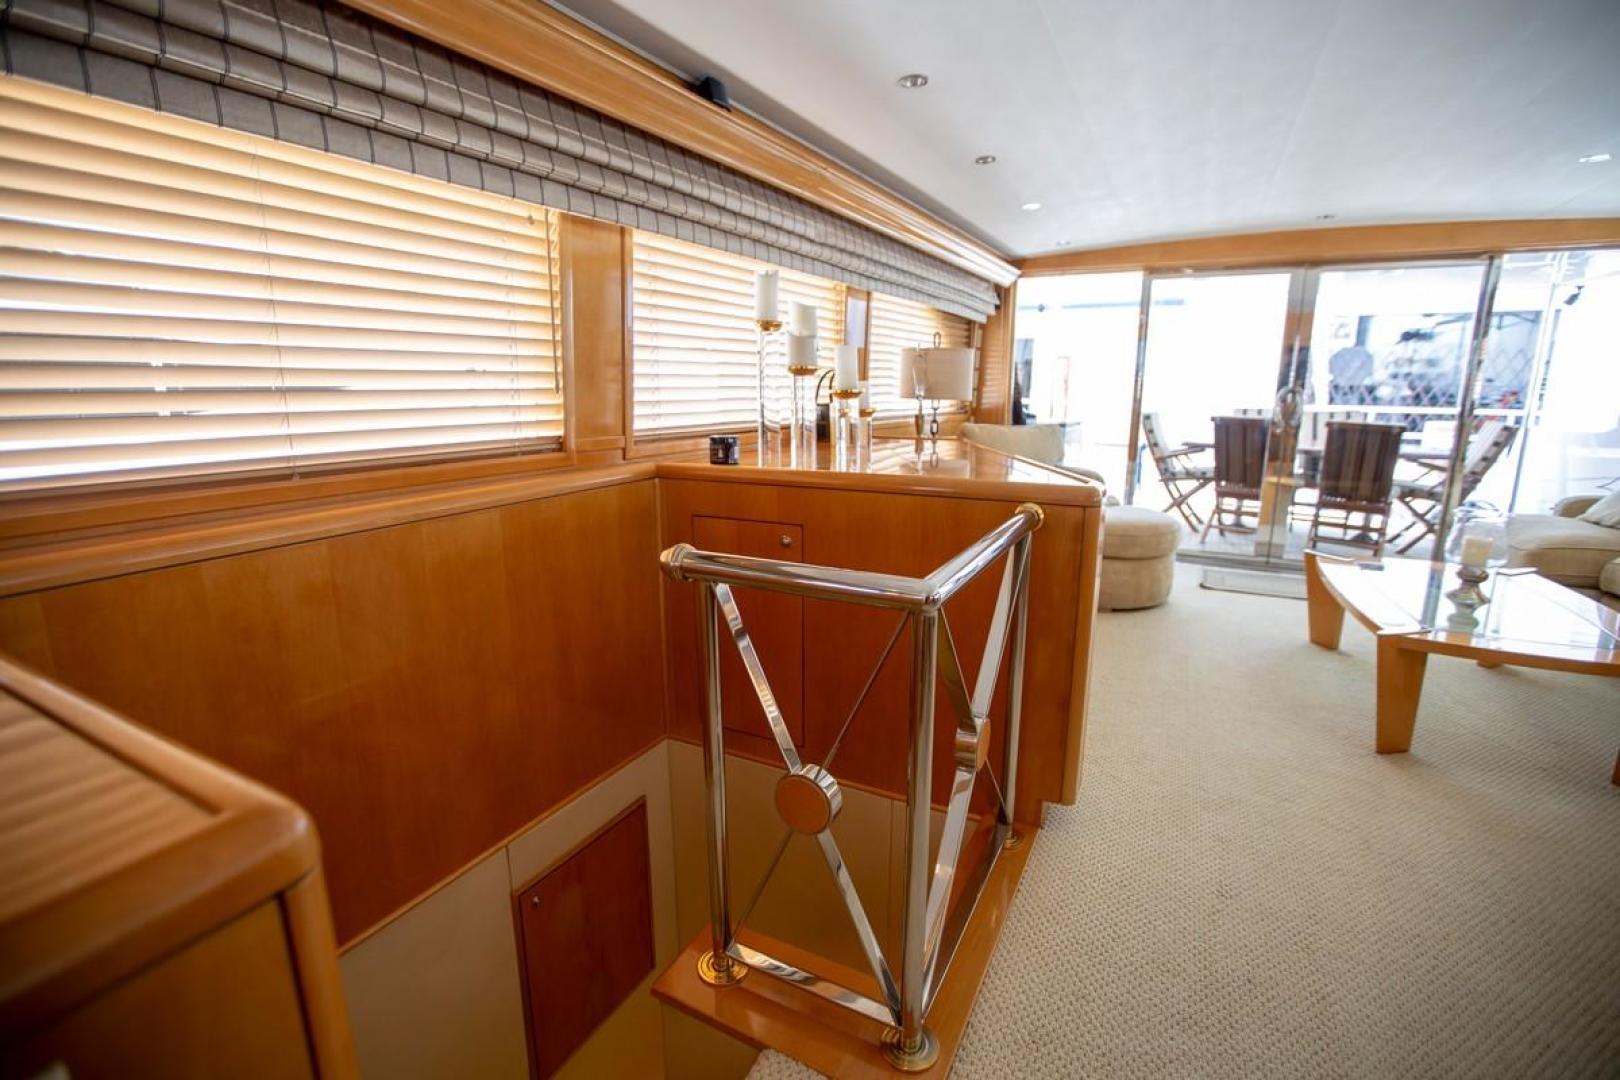 Hatteras-Cockpit Motor Yacht 2000-Getaway Ft. Lauderdale-Florida-United States-977364 | Thumbnail